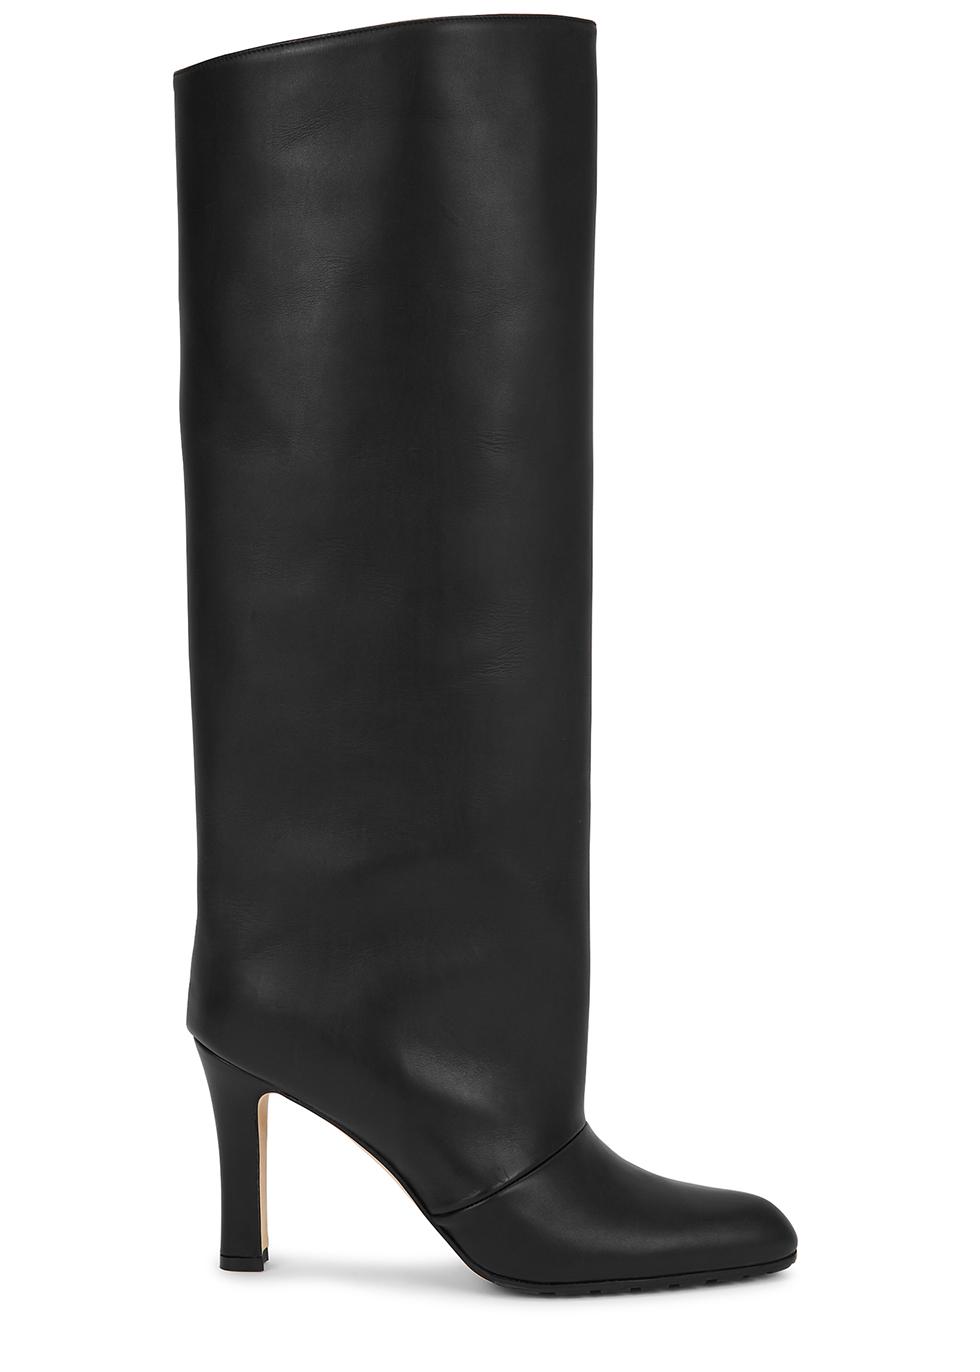 Khomobi 90 black leather knee-high boots